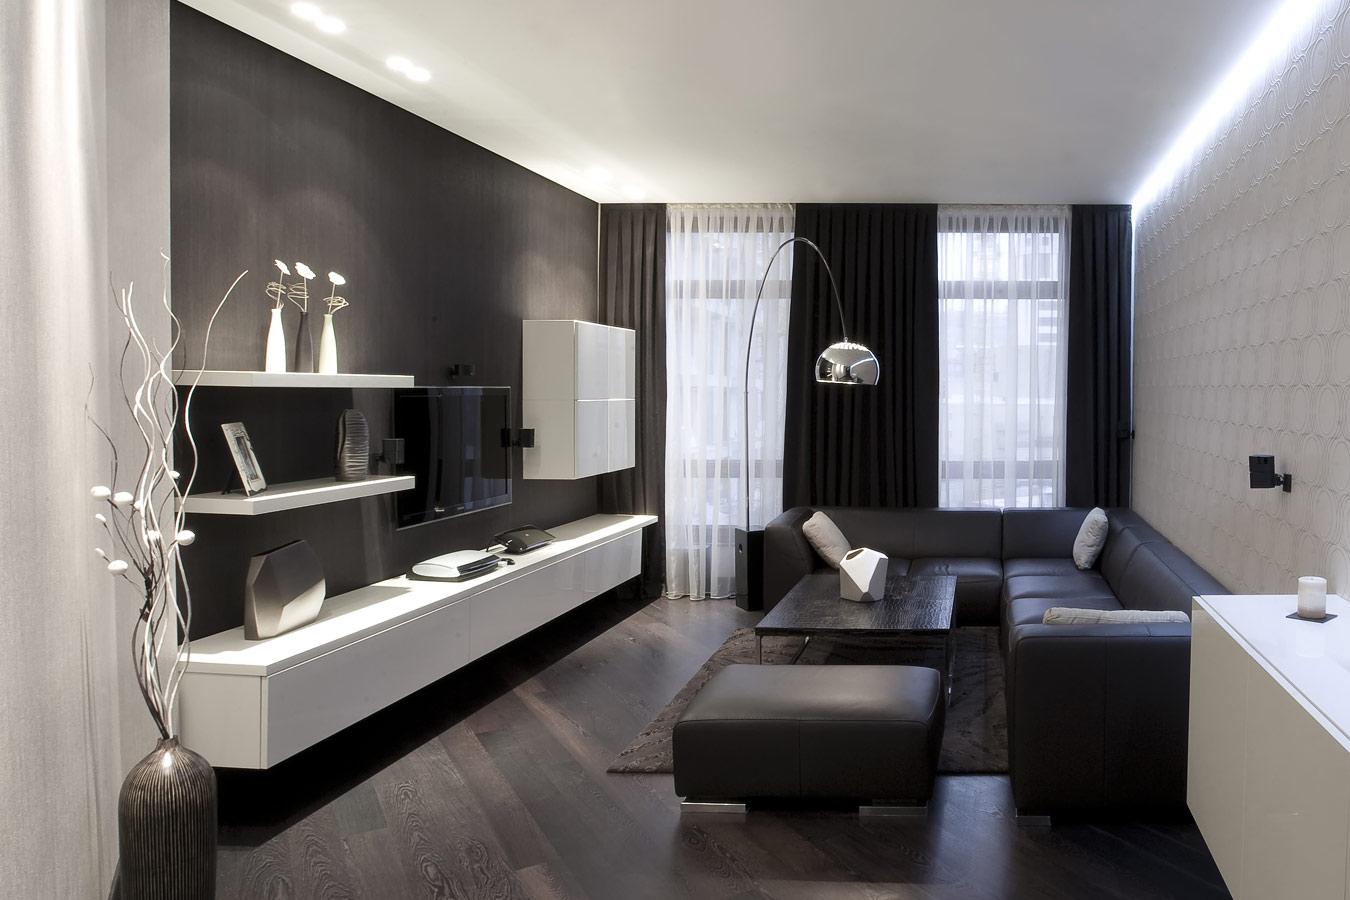 Zwevende Tv Kast : Zwevend tv meubel fun room wohnzimmer